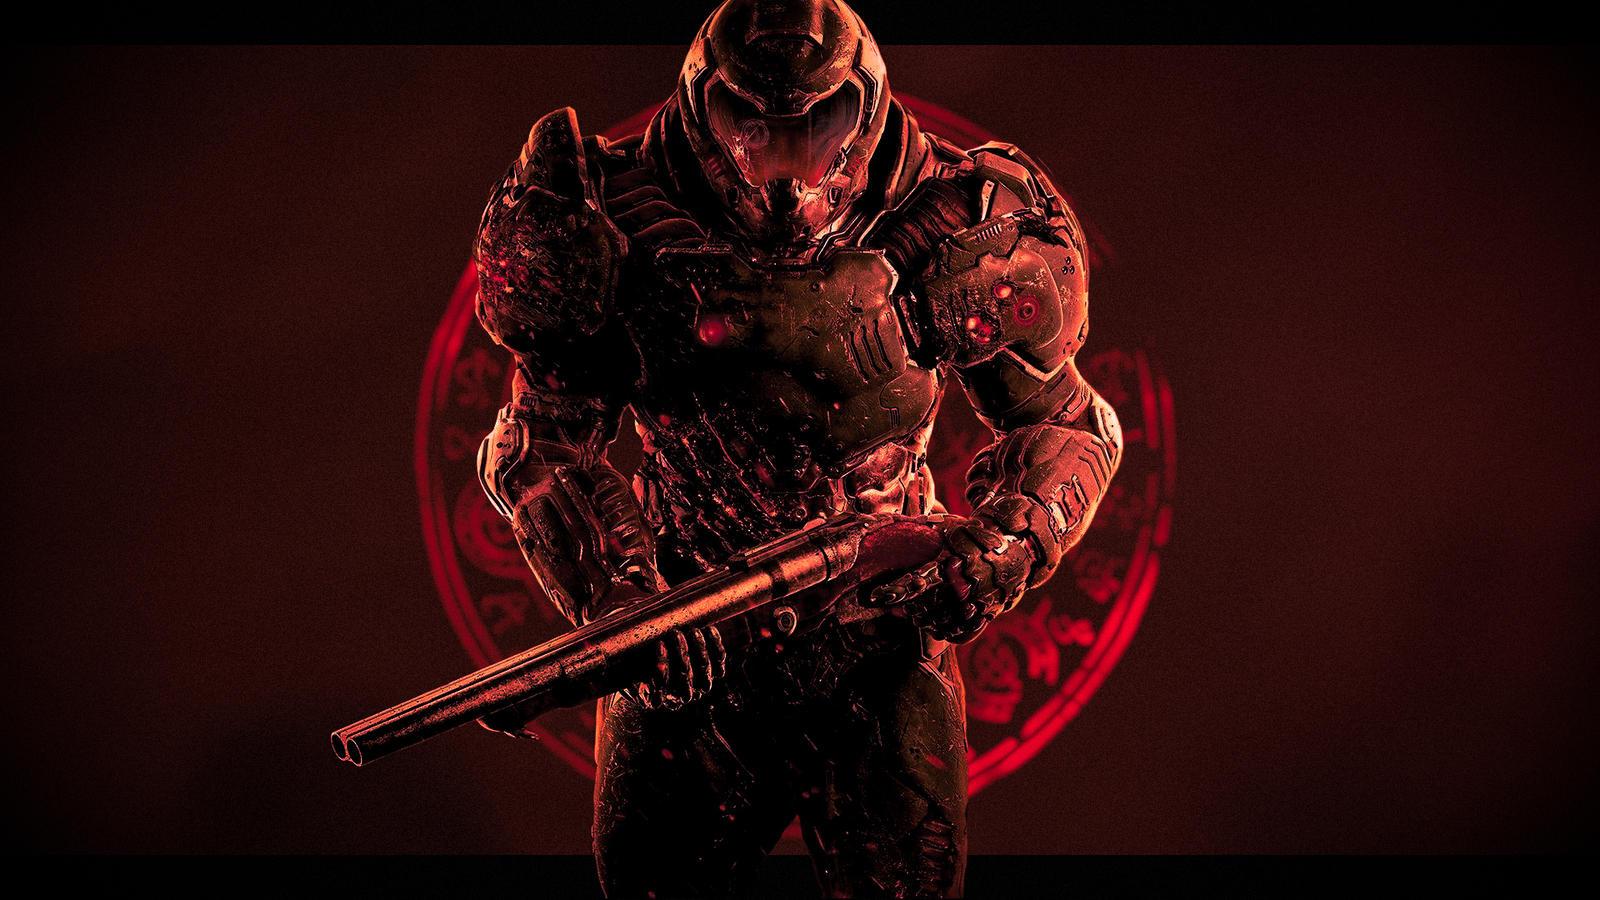 Doom Slayer (1080p) by MarkThePotato on DeviantArt